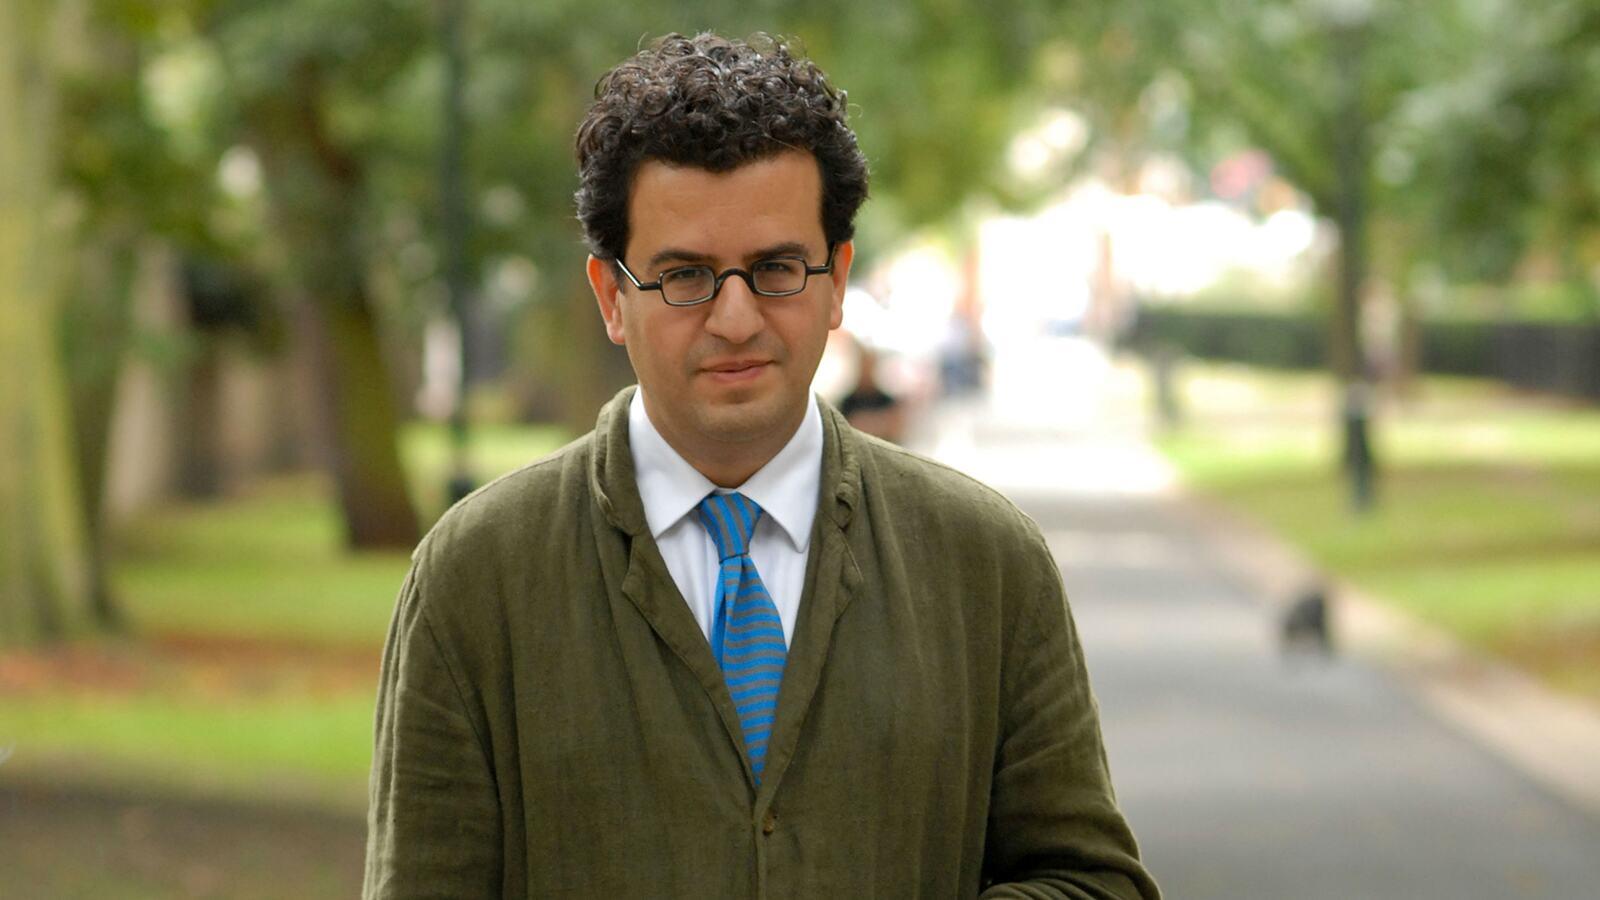 Writer, Hisham Matar